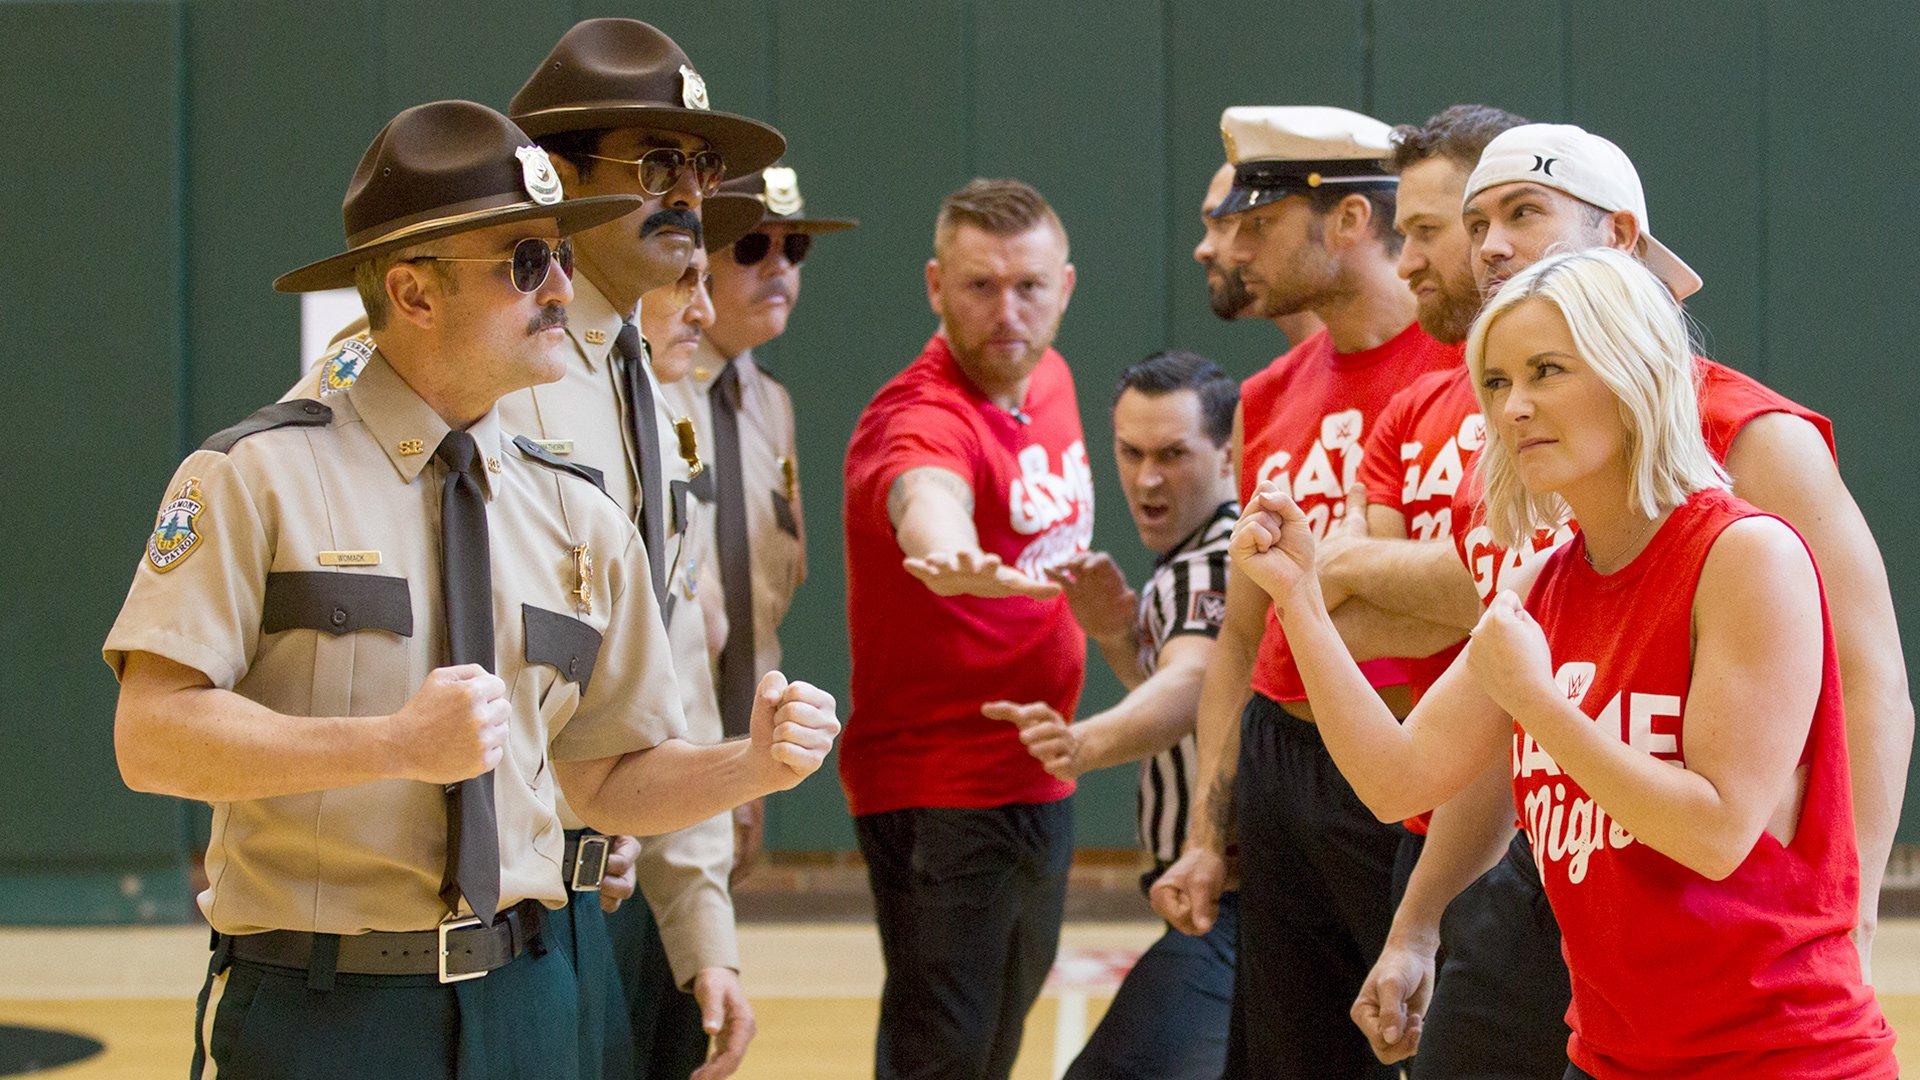 WWE Superstars vs. Super Troopers dans un dodgeball: WWE Game Night